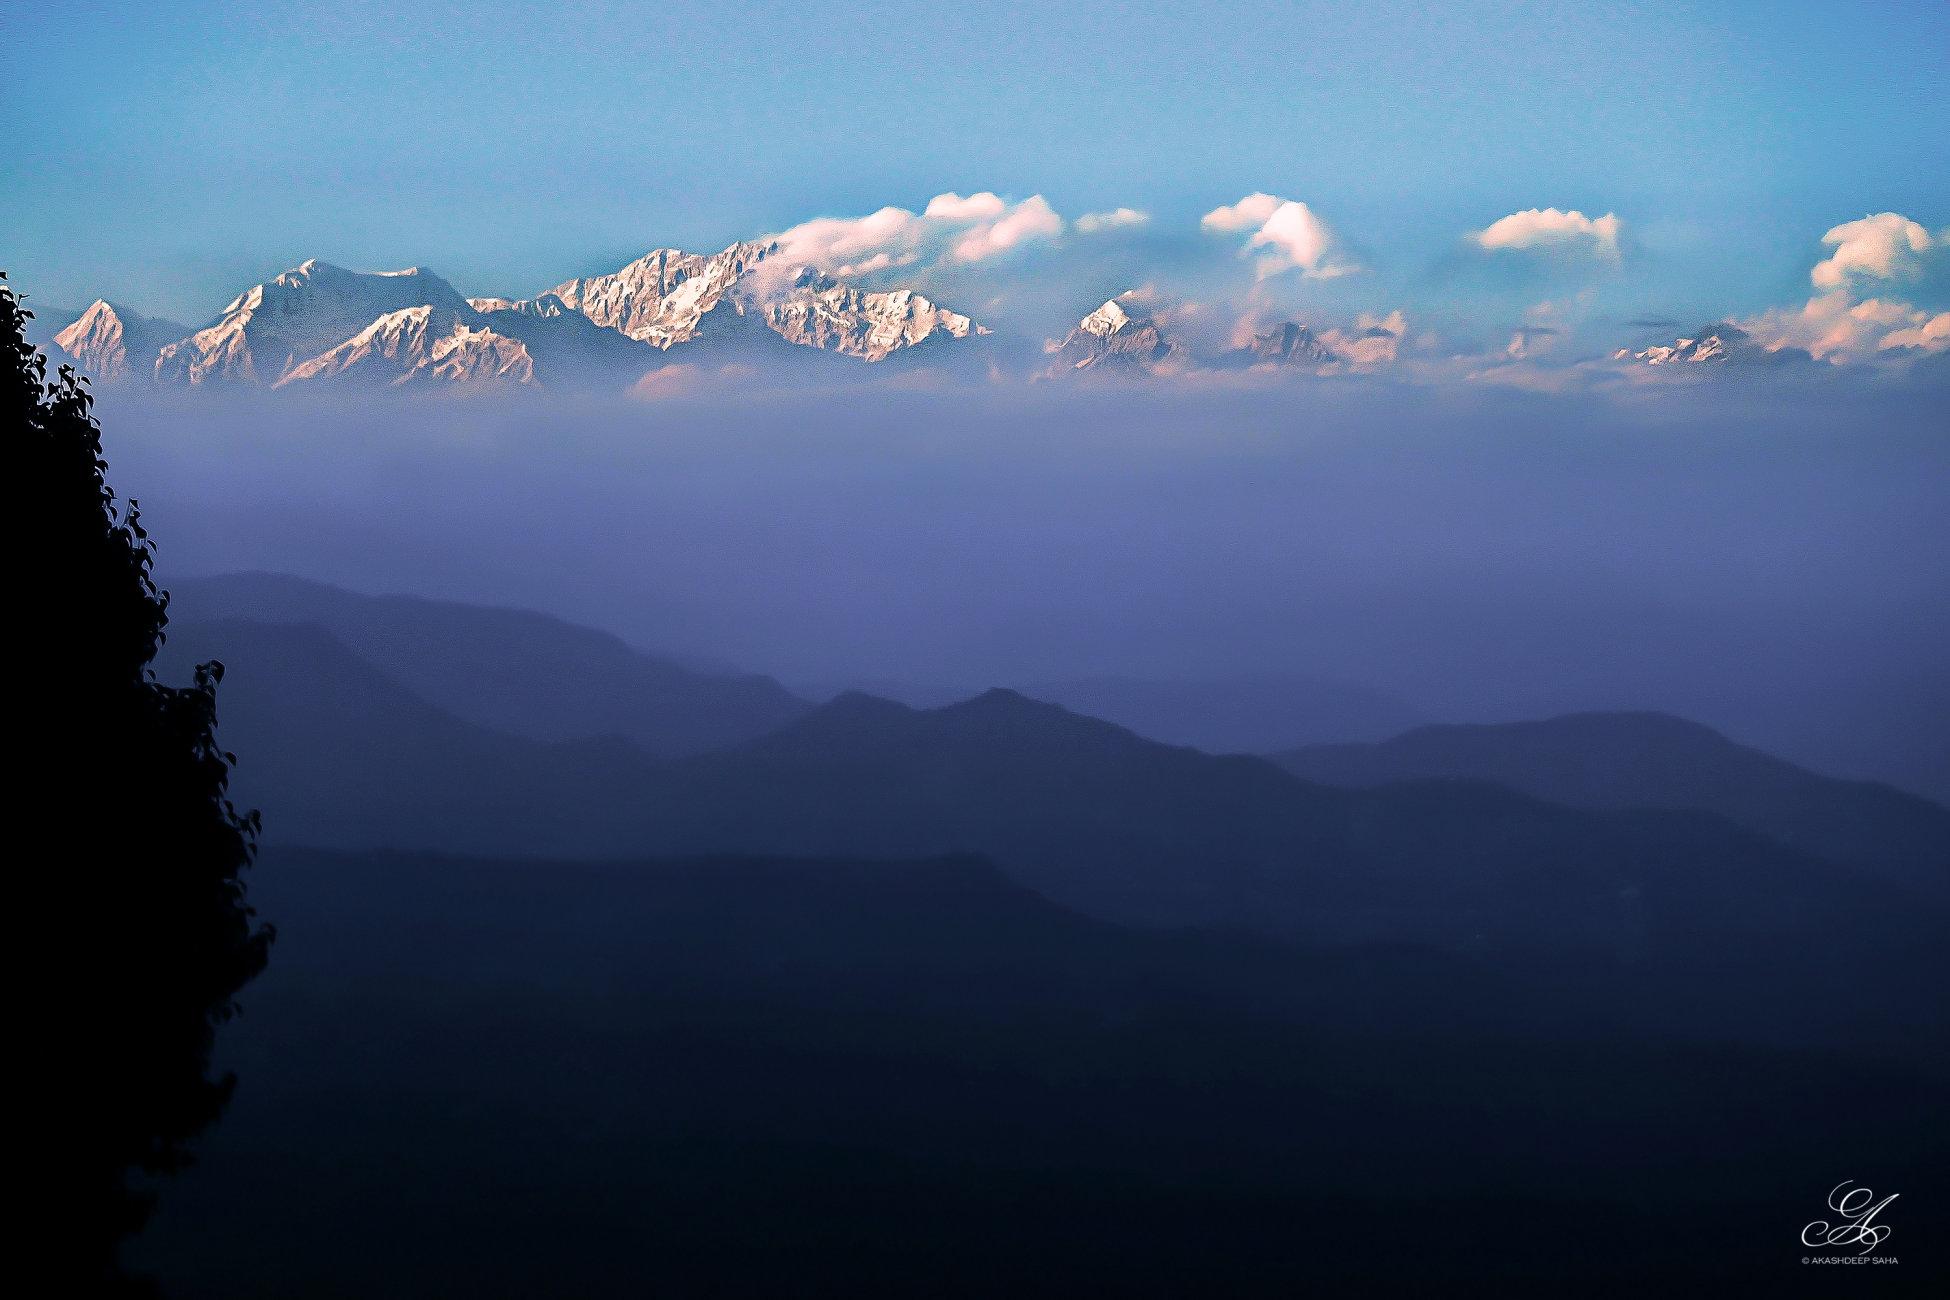 | The Kanchenjunga |